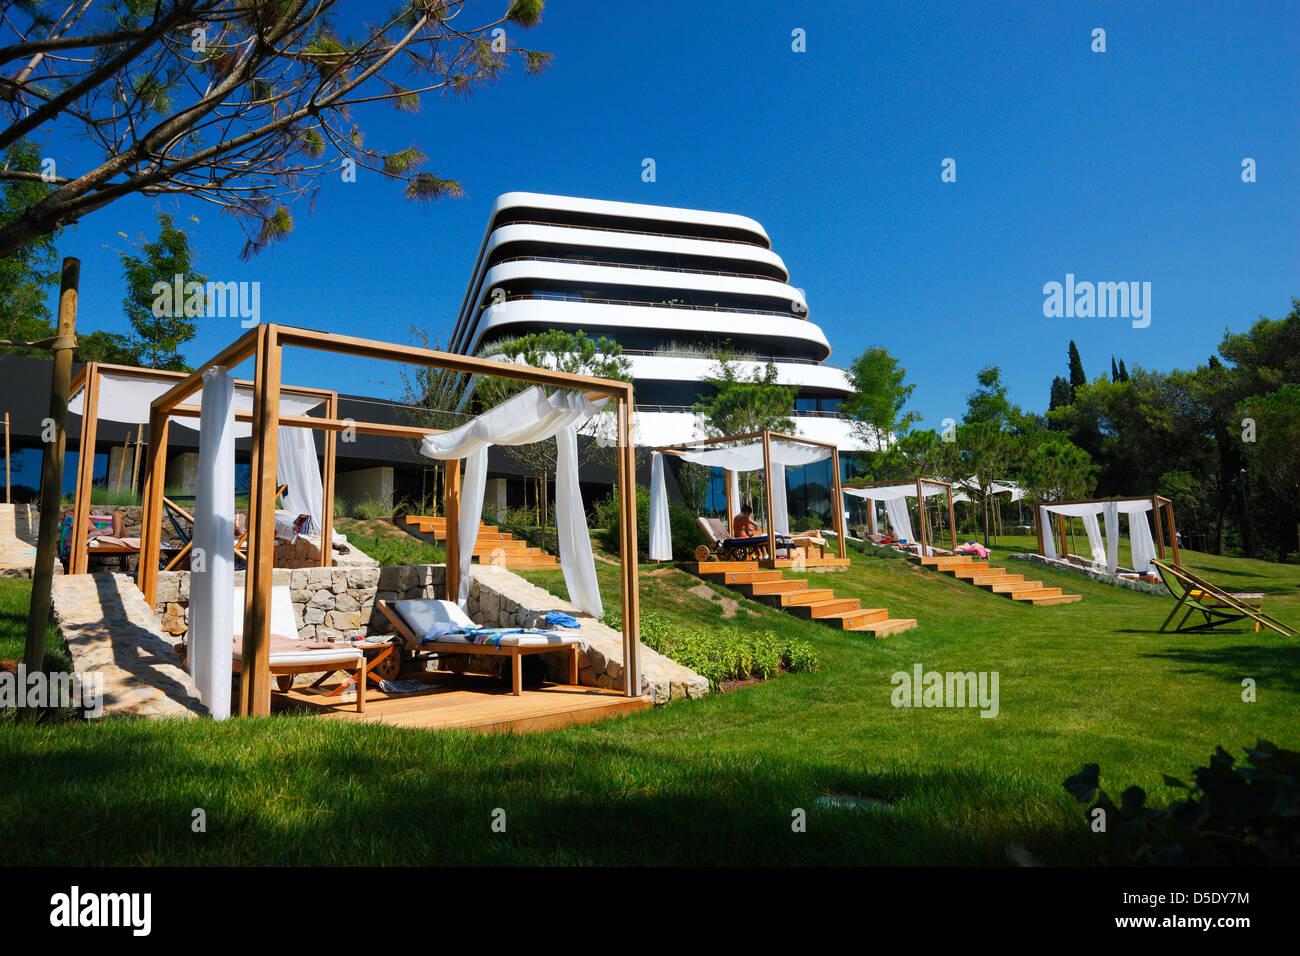 Hotel lone in rovinj croatia stock photo 55011144 alamy hotel lone in rovinj croatia sisterspd